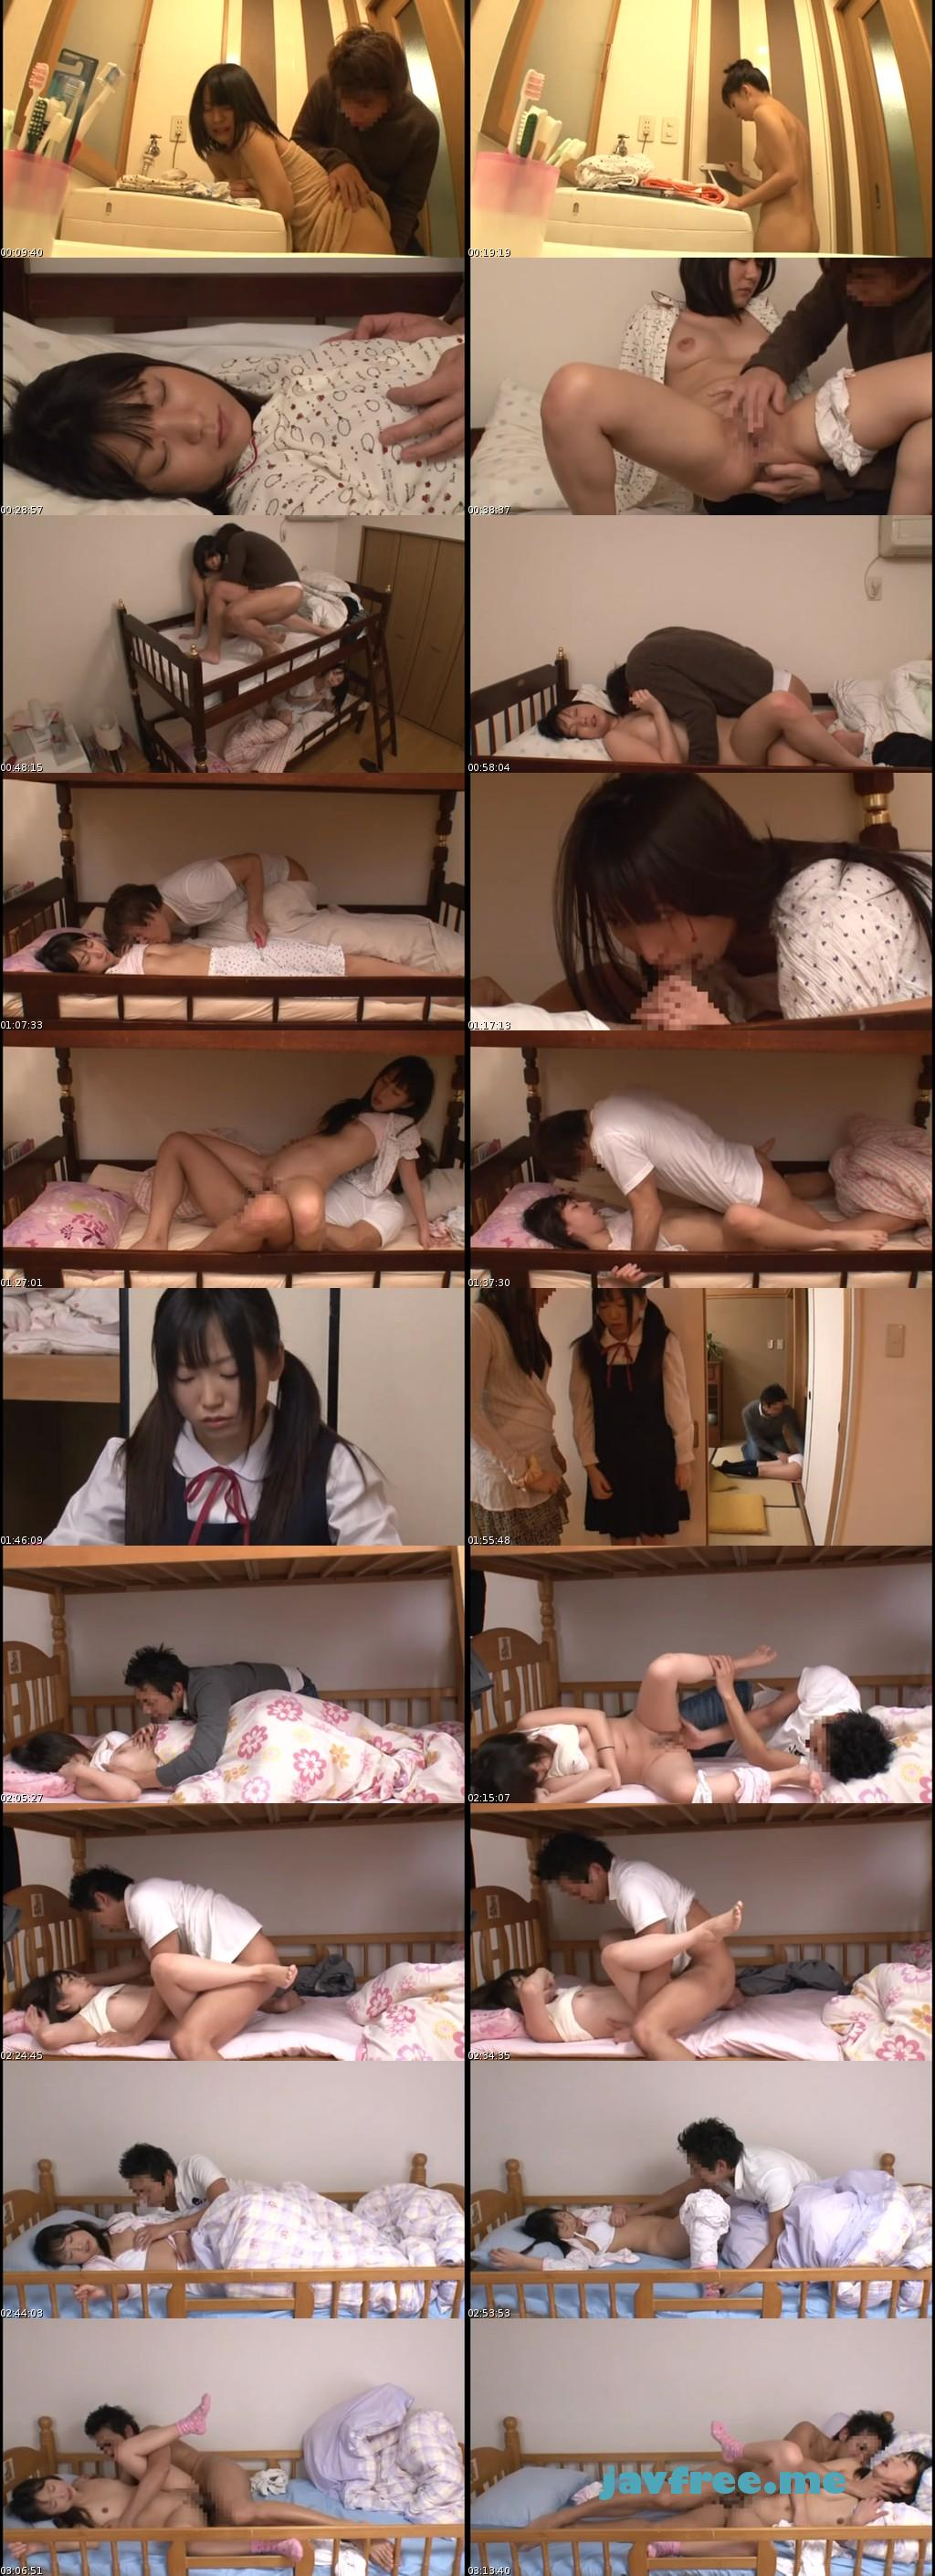 [NHDTA 374] 2段ベッドが揺れるほど感じる姉の喘ぎ声を聞いて発情しだす妹 7 NHDTA